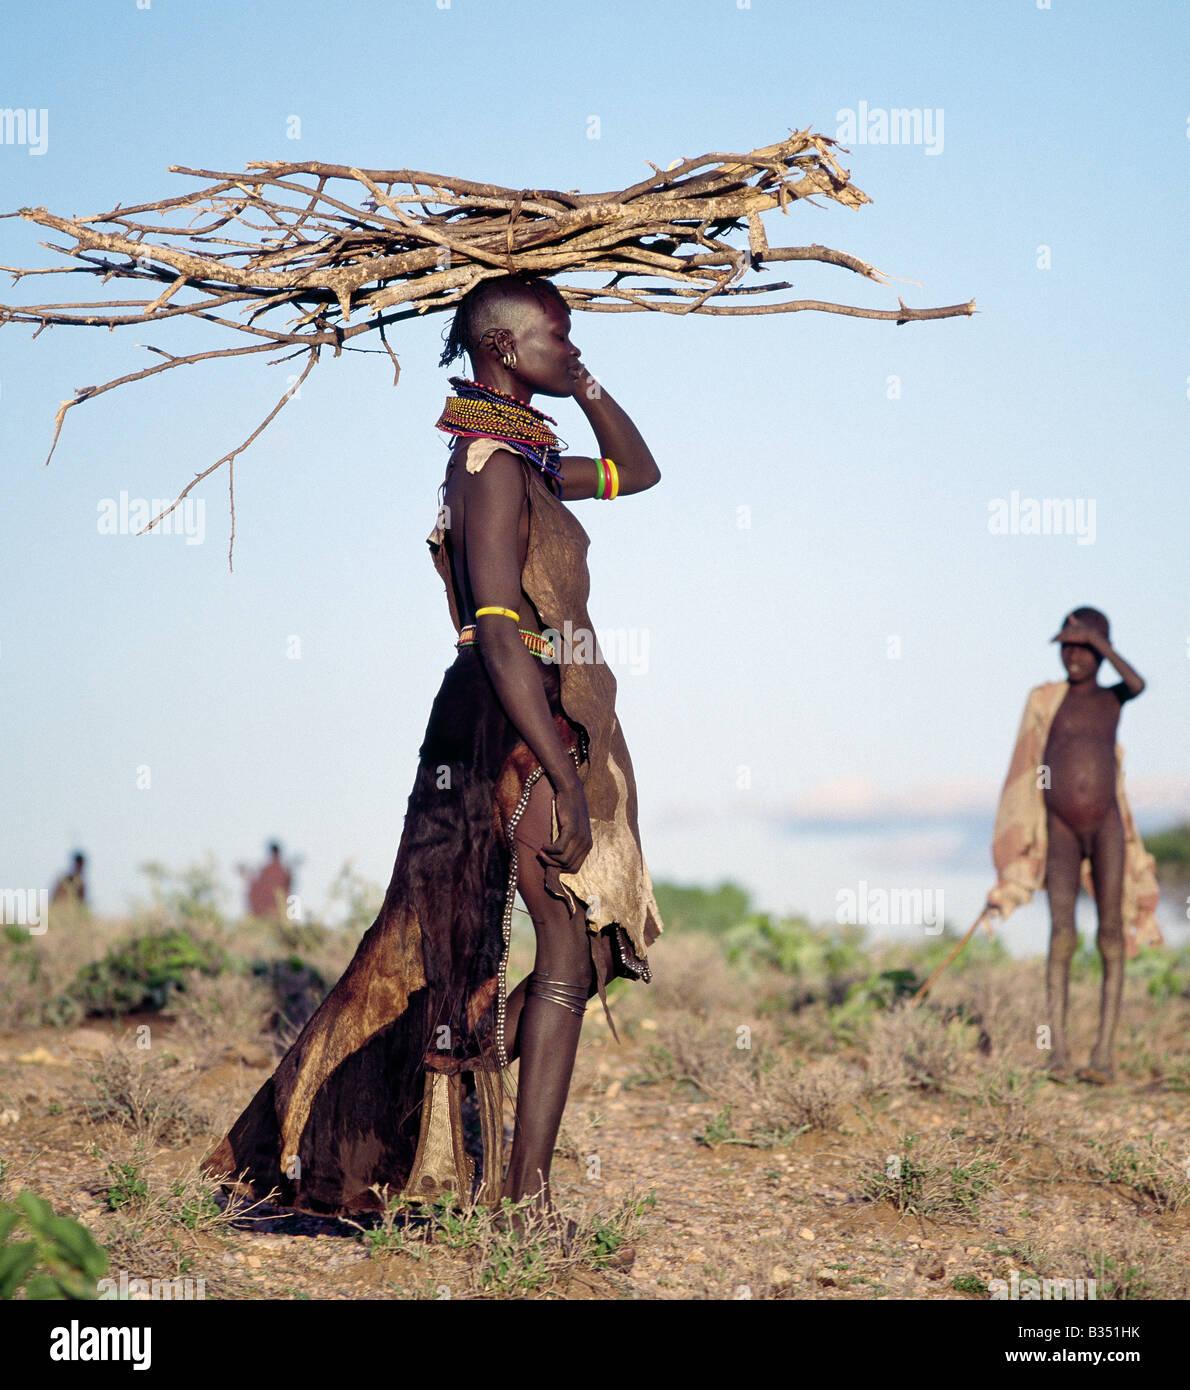 Kenya, Turkana, Nachola. In the semi-arid terrain of Turkanaland, women have to travel great distances to collect - Stock Photo